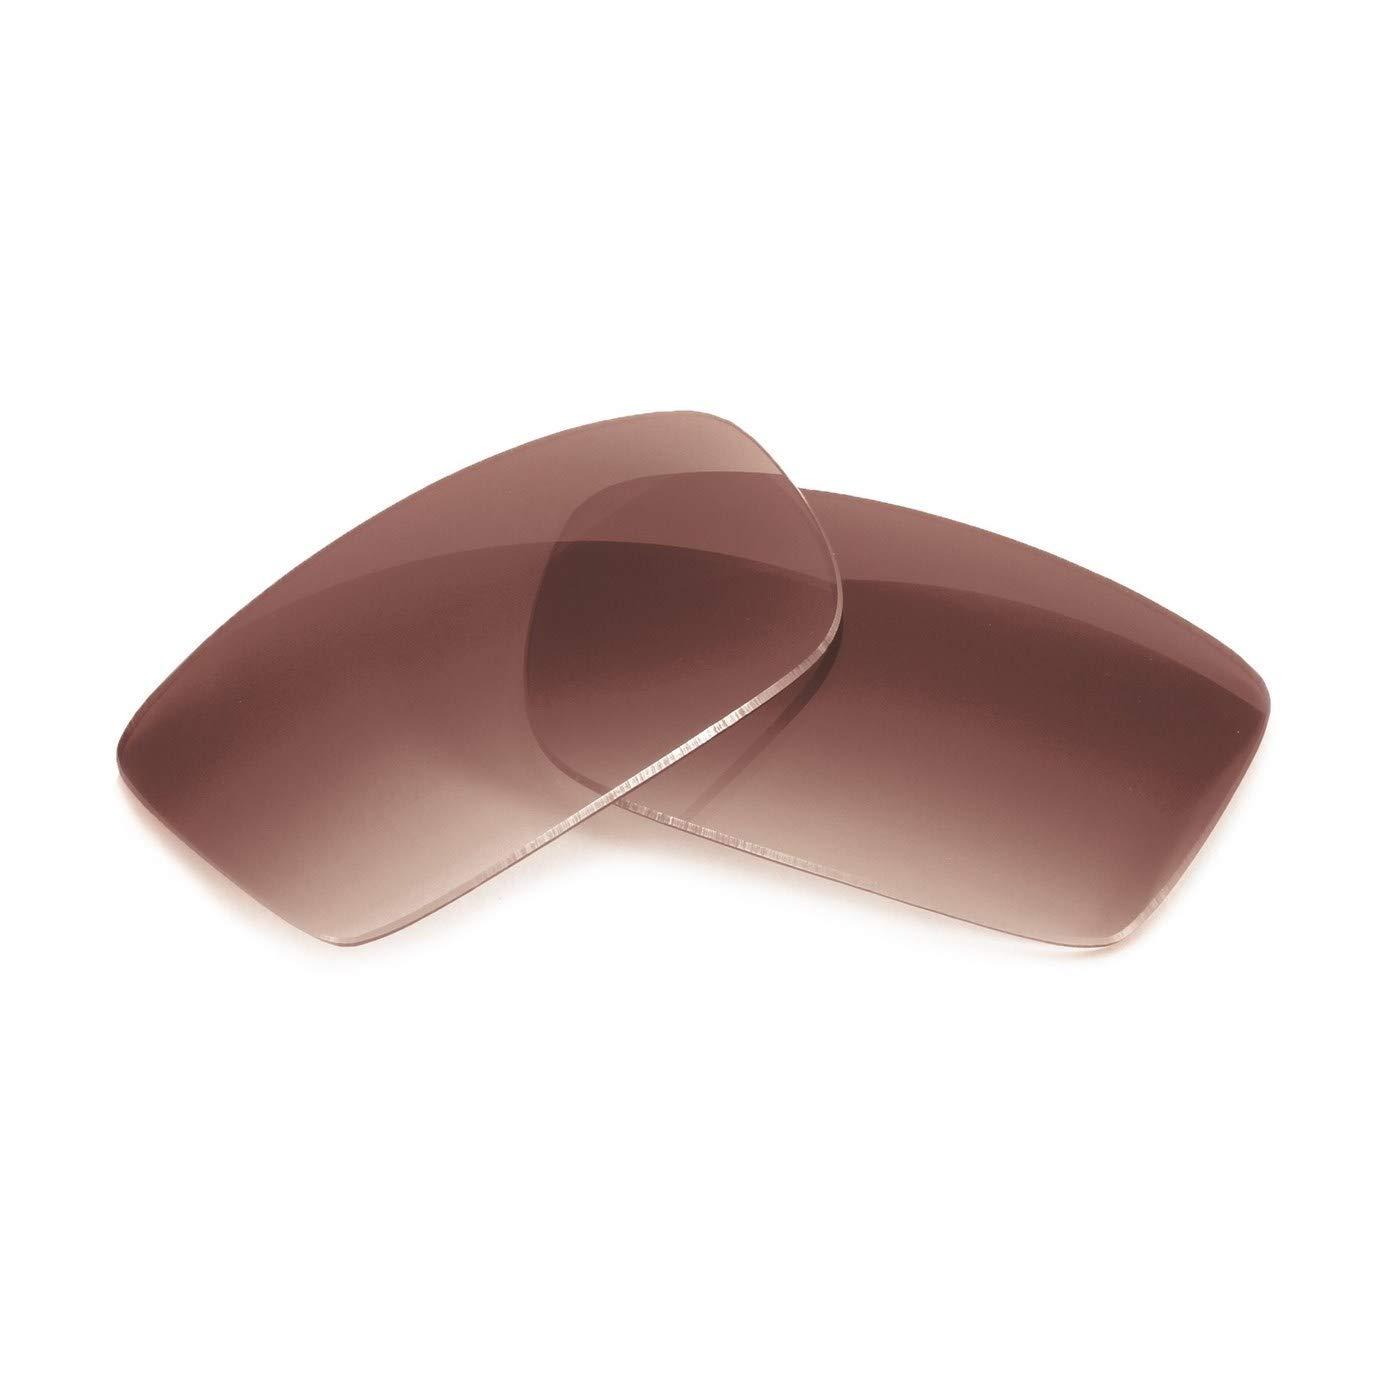 Fuse Lenses Non-Polarized Replacement Lenses for Bolle Origin